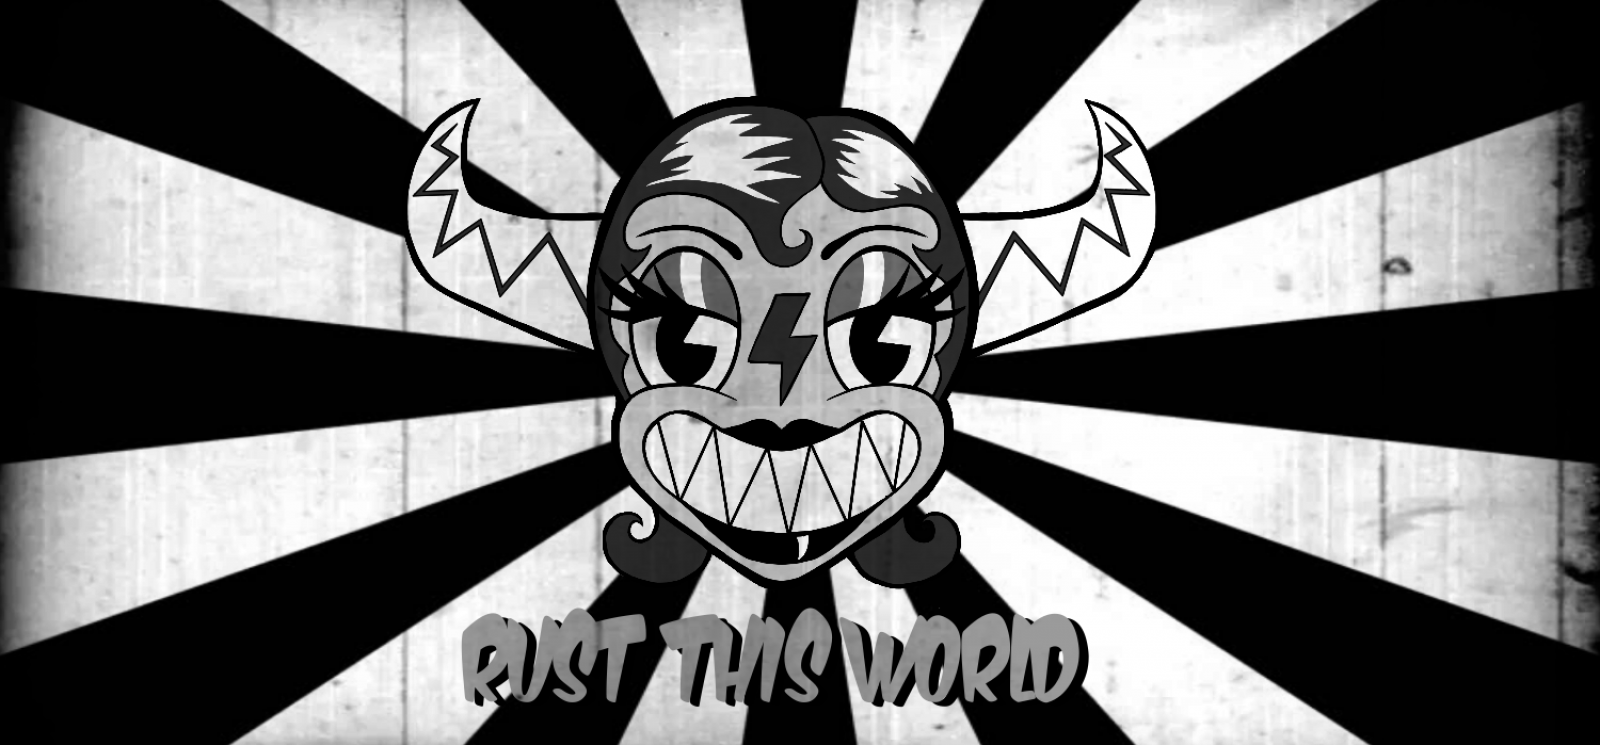 Rust This World